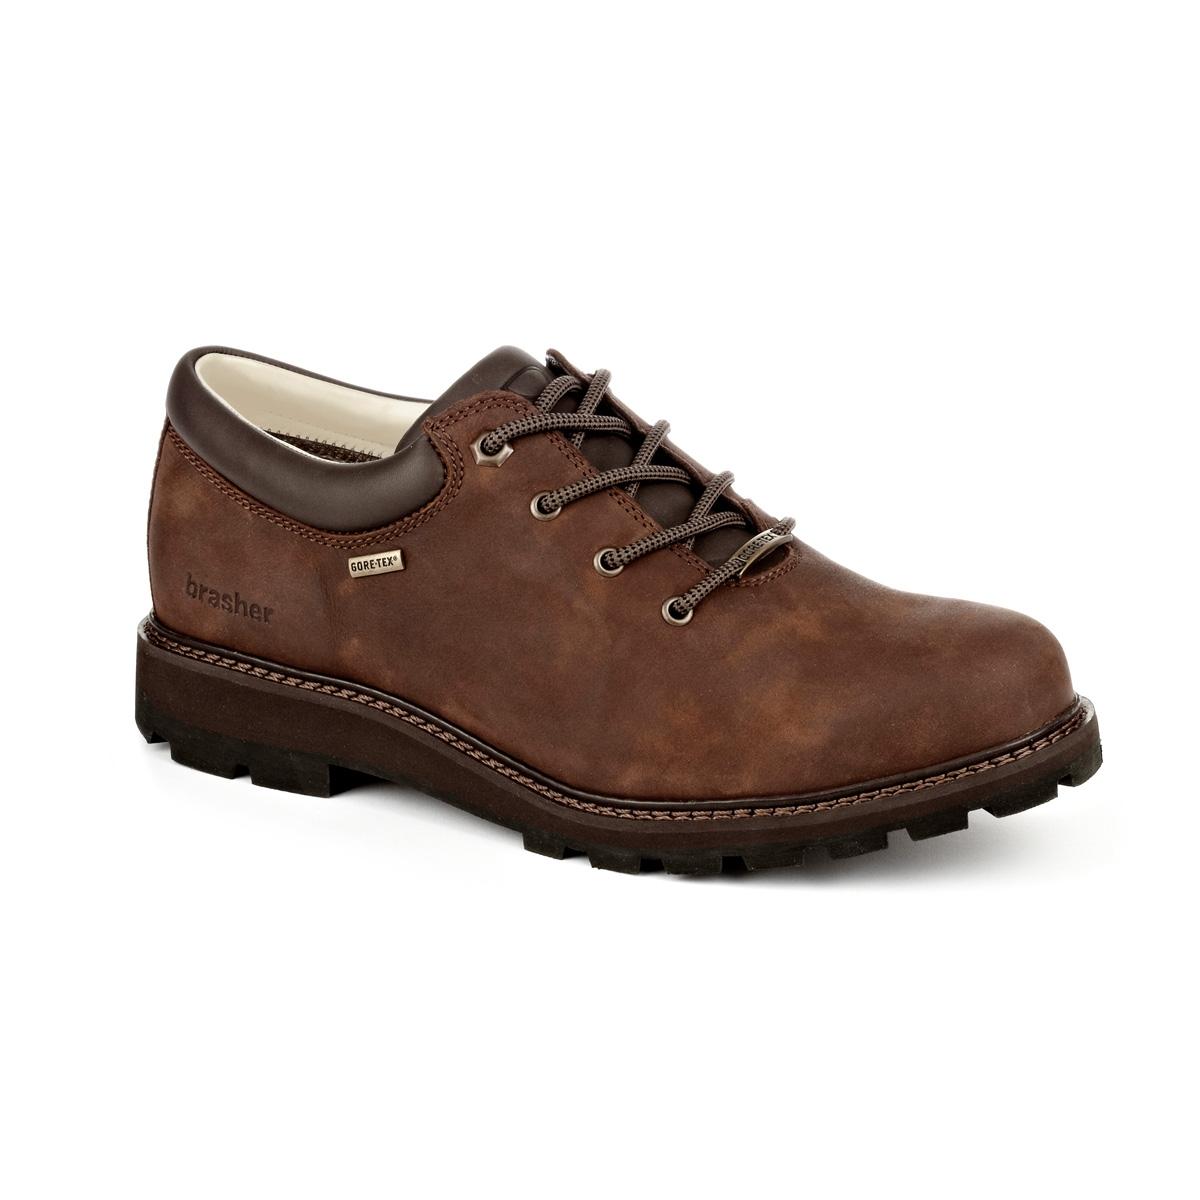 Brasher Walking Shoes Black